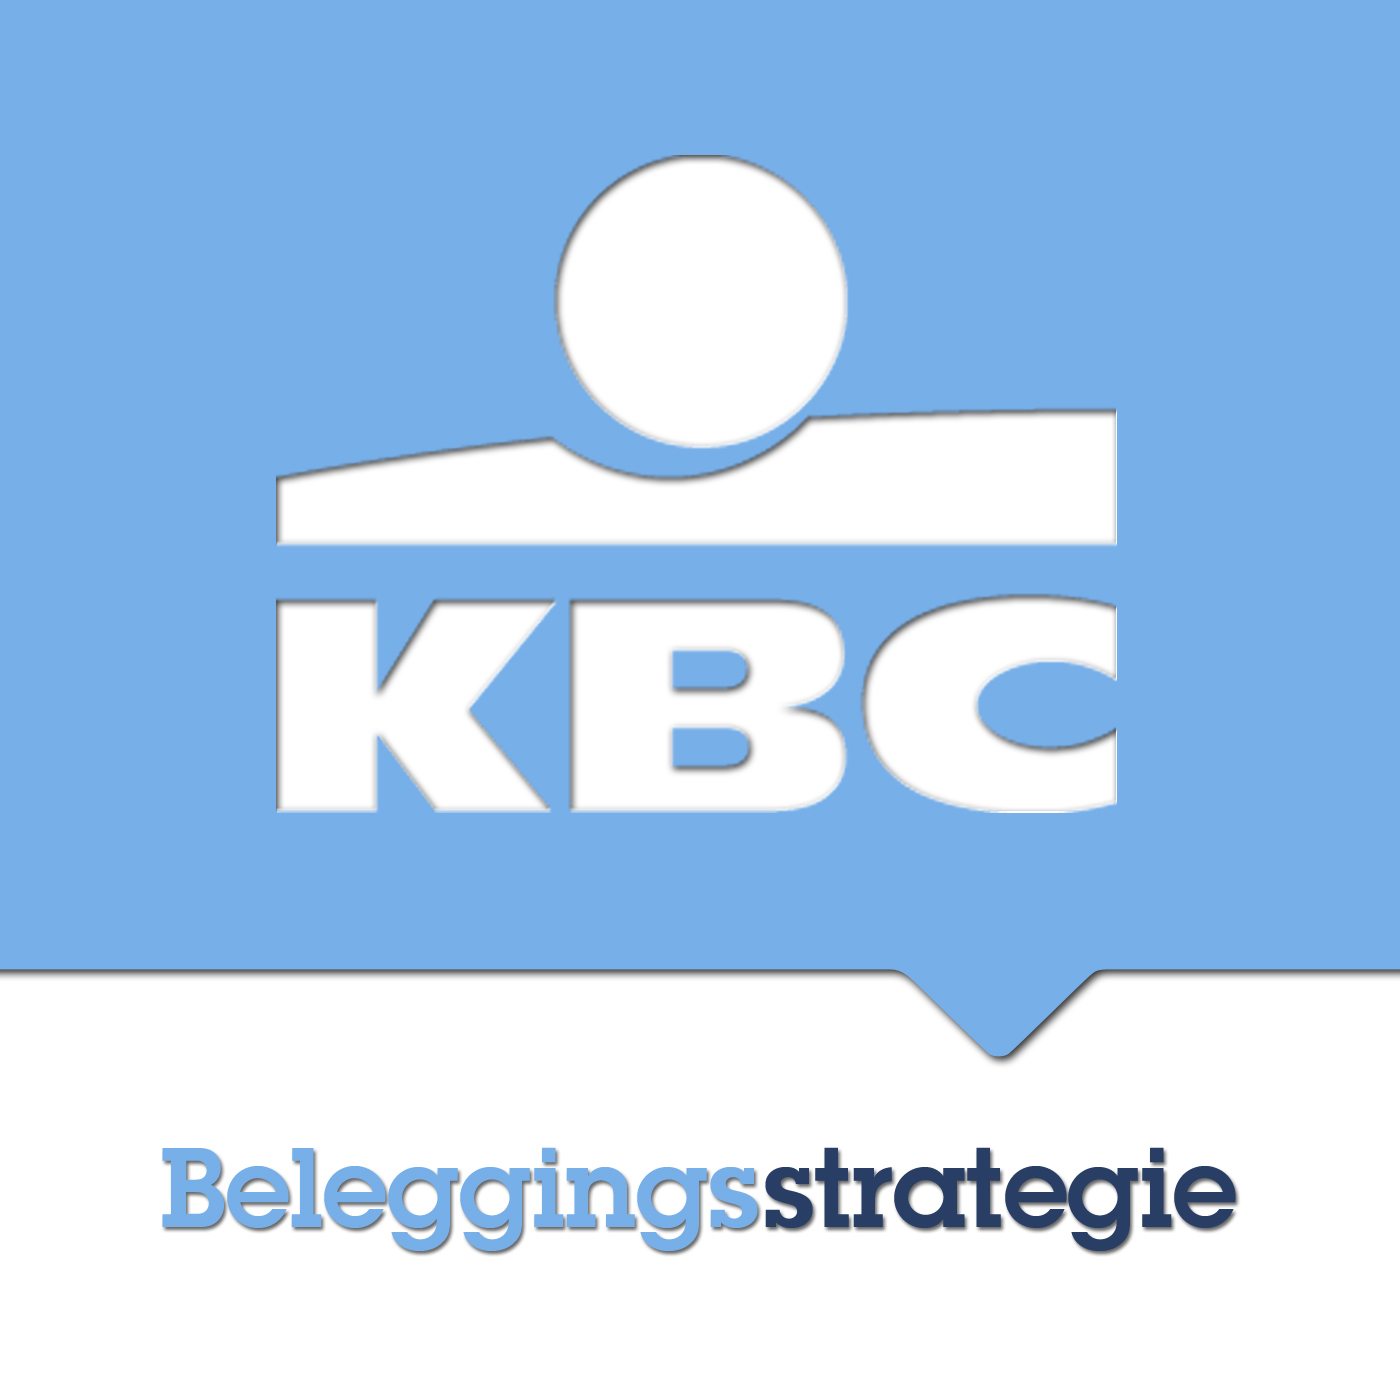 KBC-beleggingsstrategie